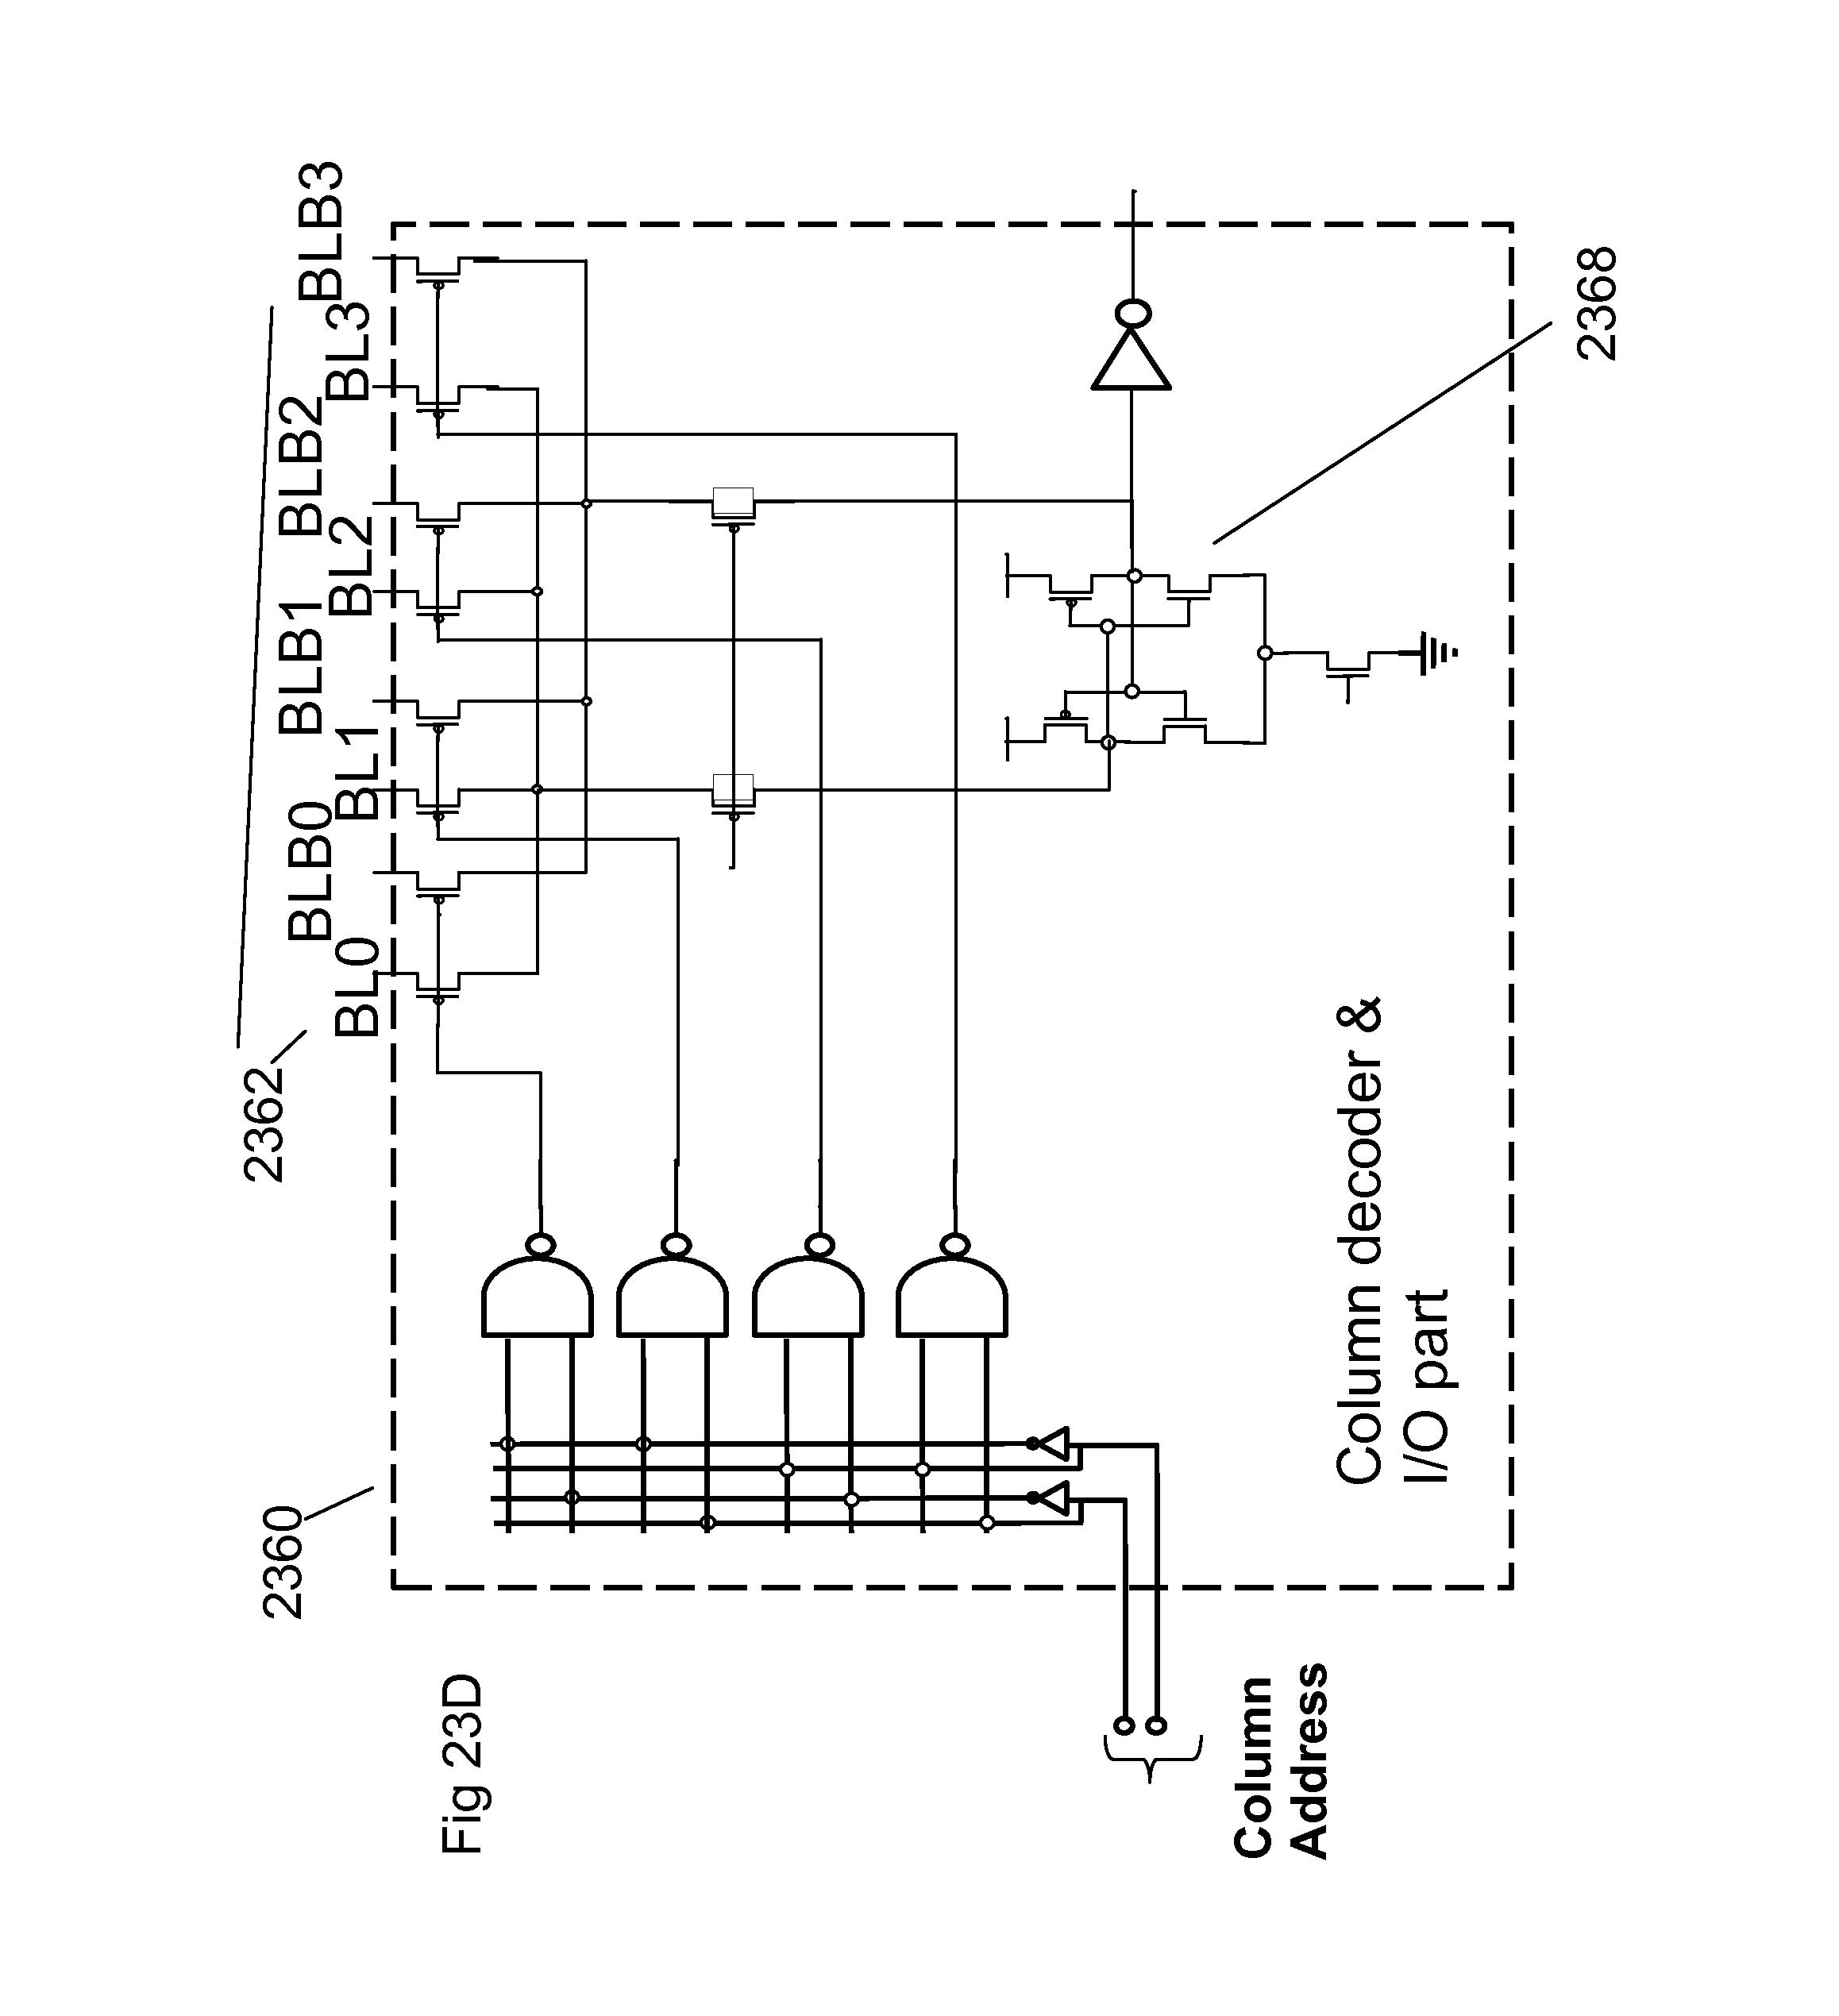 Patent Us 8846463 B1 Penn Manufacturing Wiring Diagrams Images